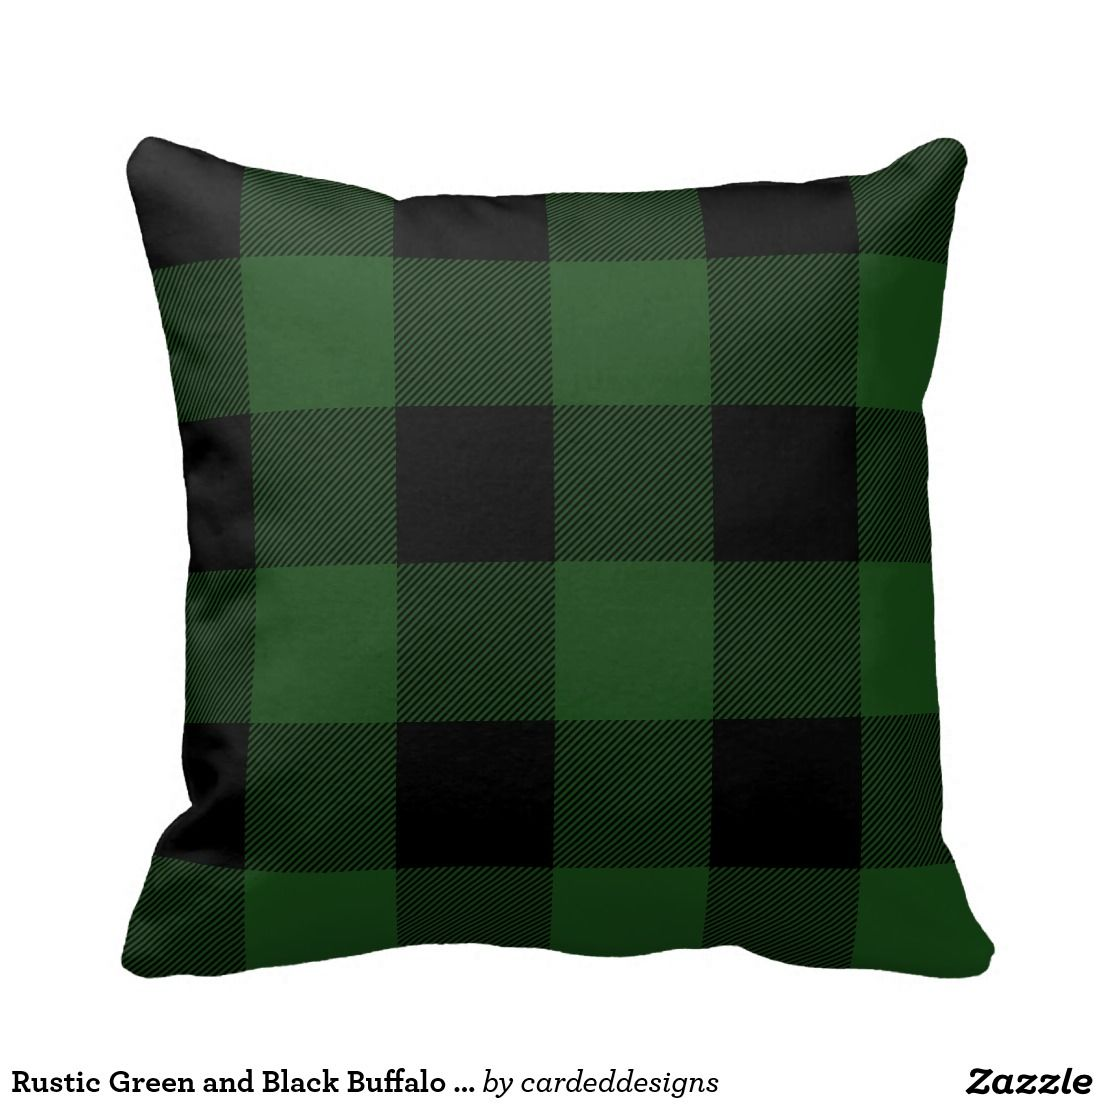 Rustic Green And Black Buffalo Check Plaid Throw Pillow Zazzle Com Plaid Throw Pillows Buffalo Plaid Decor Green Plaid Pillows